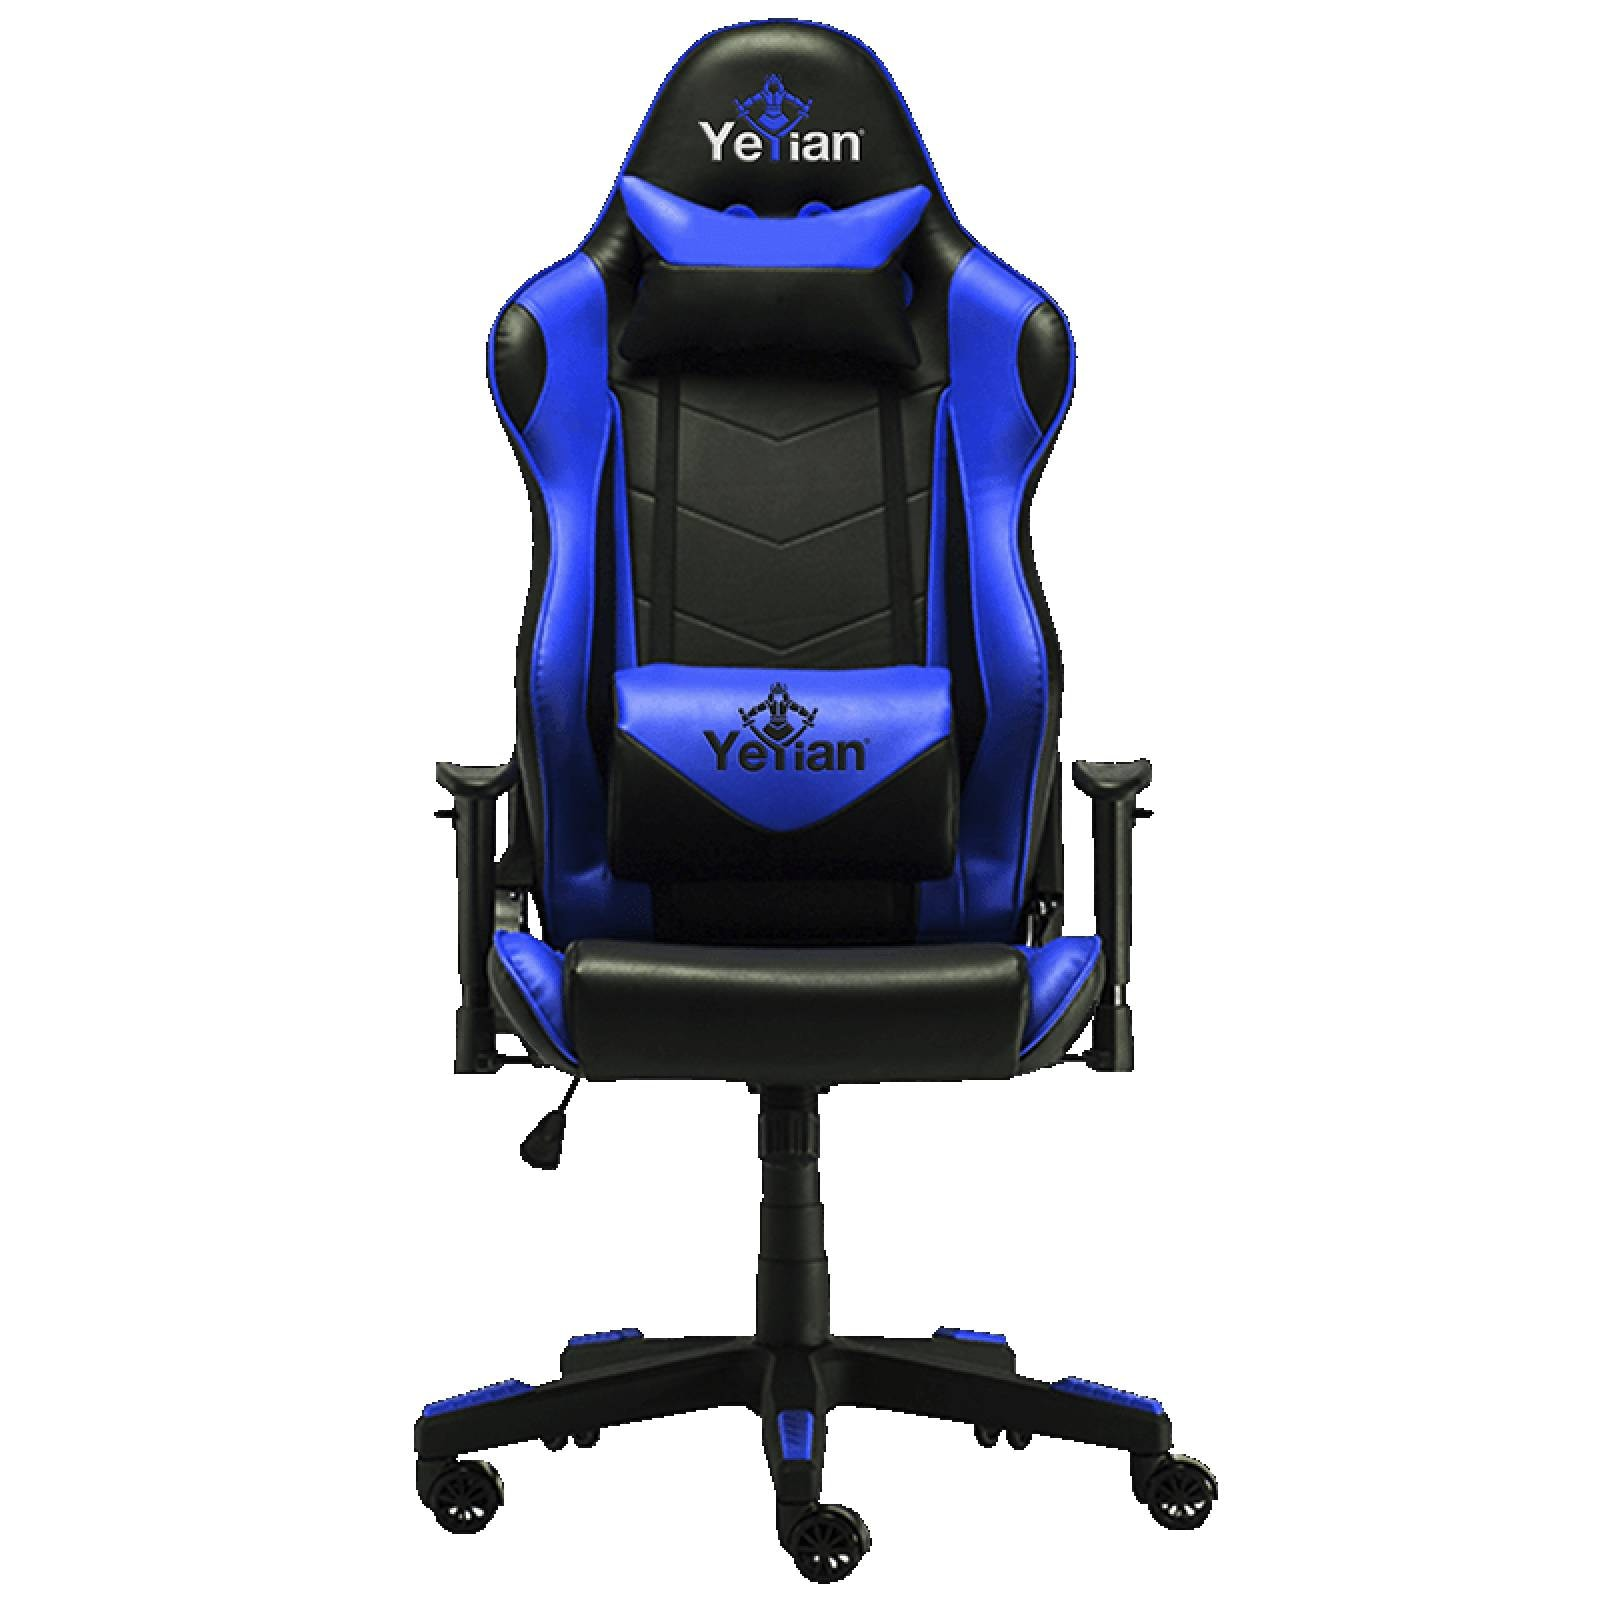 Silla gaming Yeyian cadira 1150,(ysgc1150a)